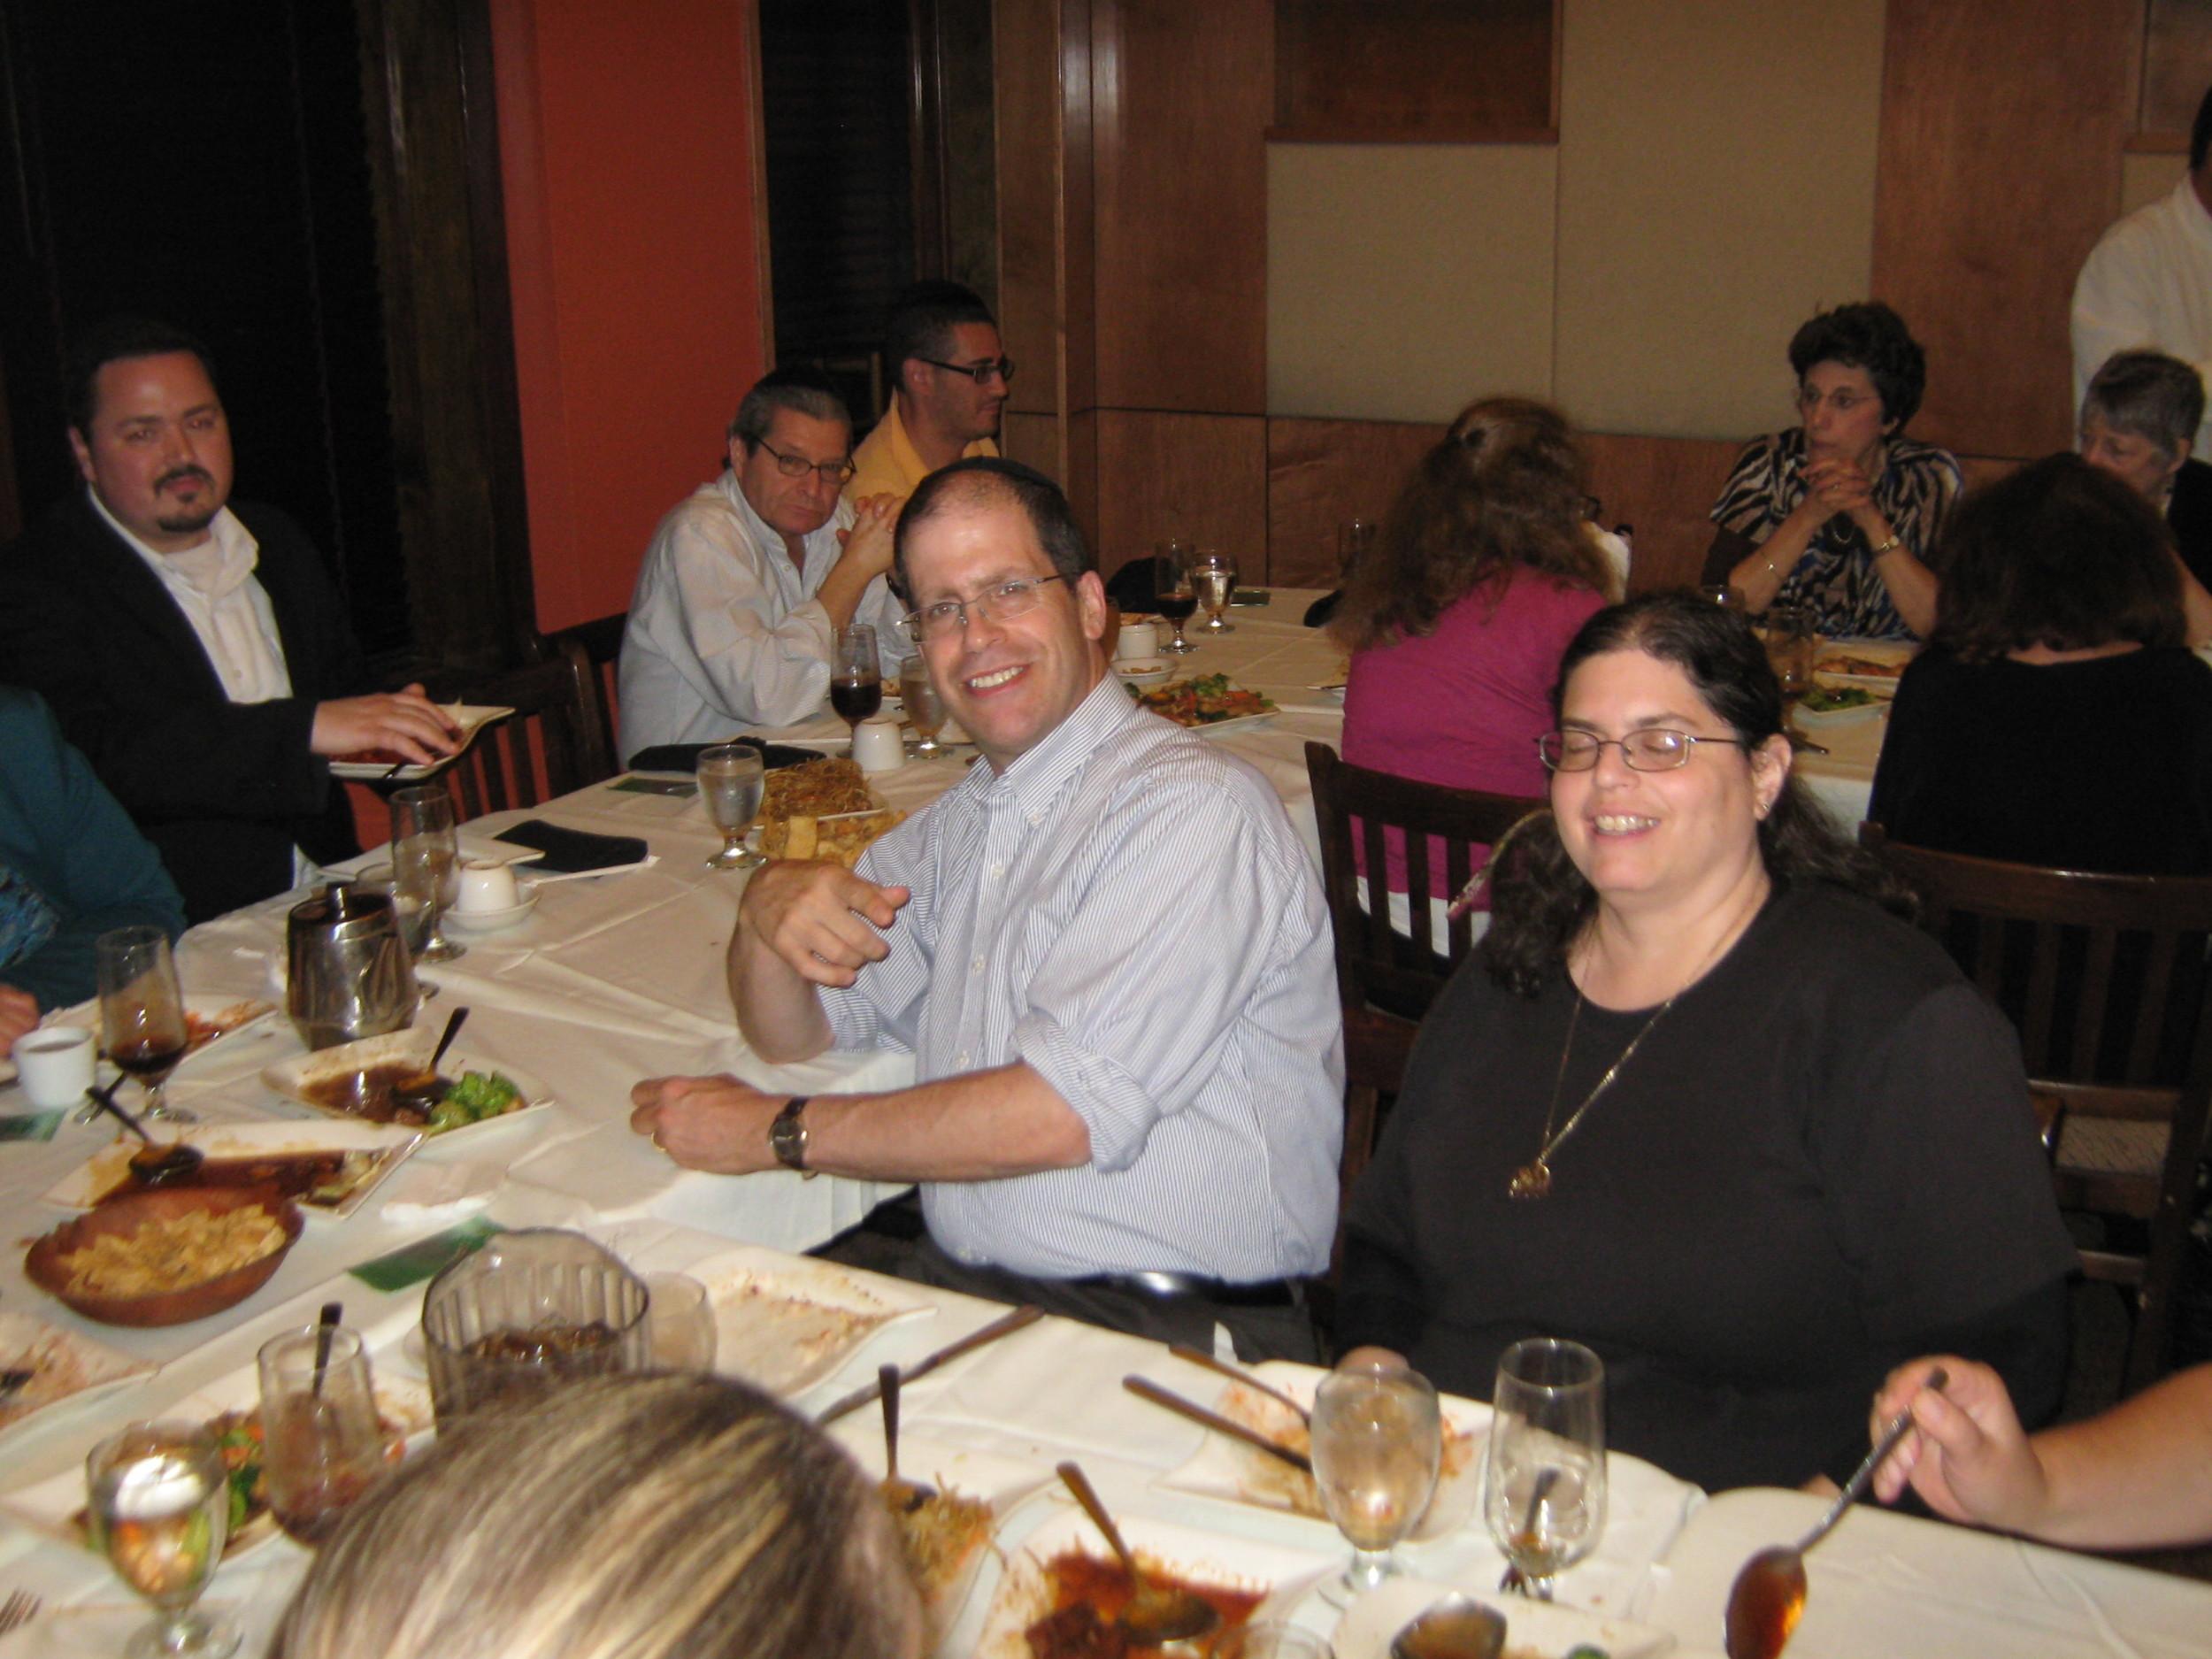 Annual Bruce Greenfield Pre-Kol Nidre Memorial Dinner August 2014